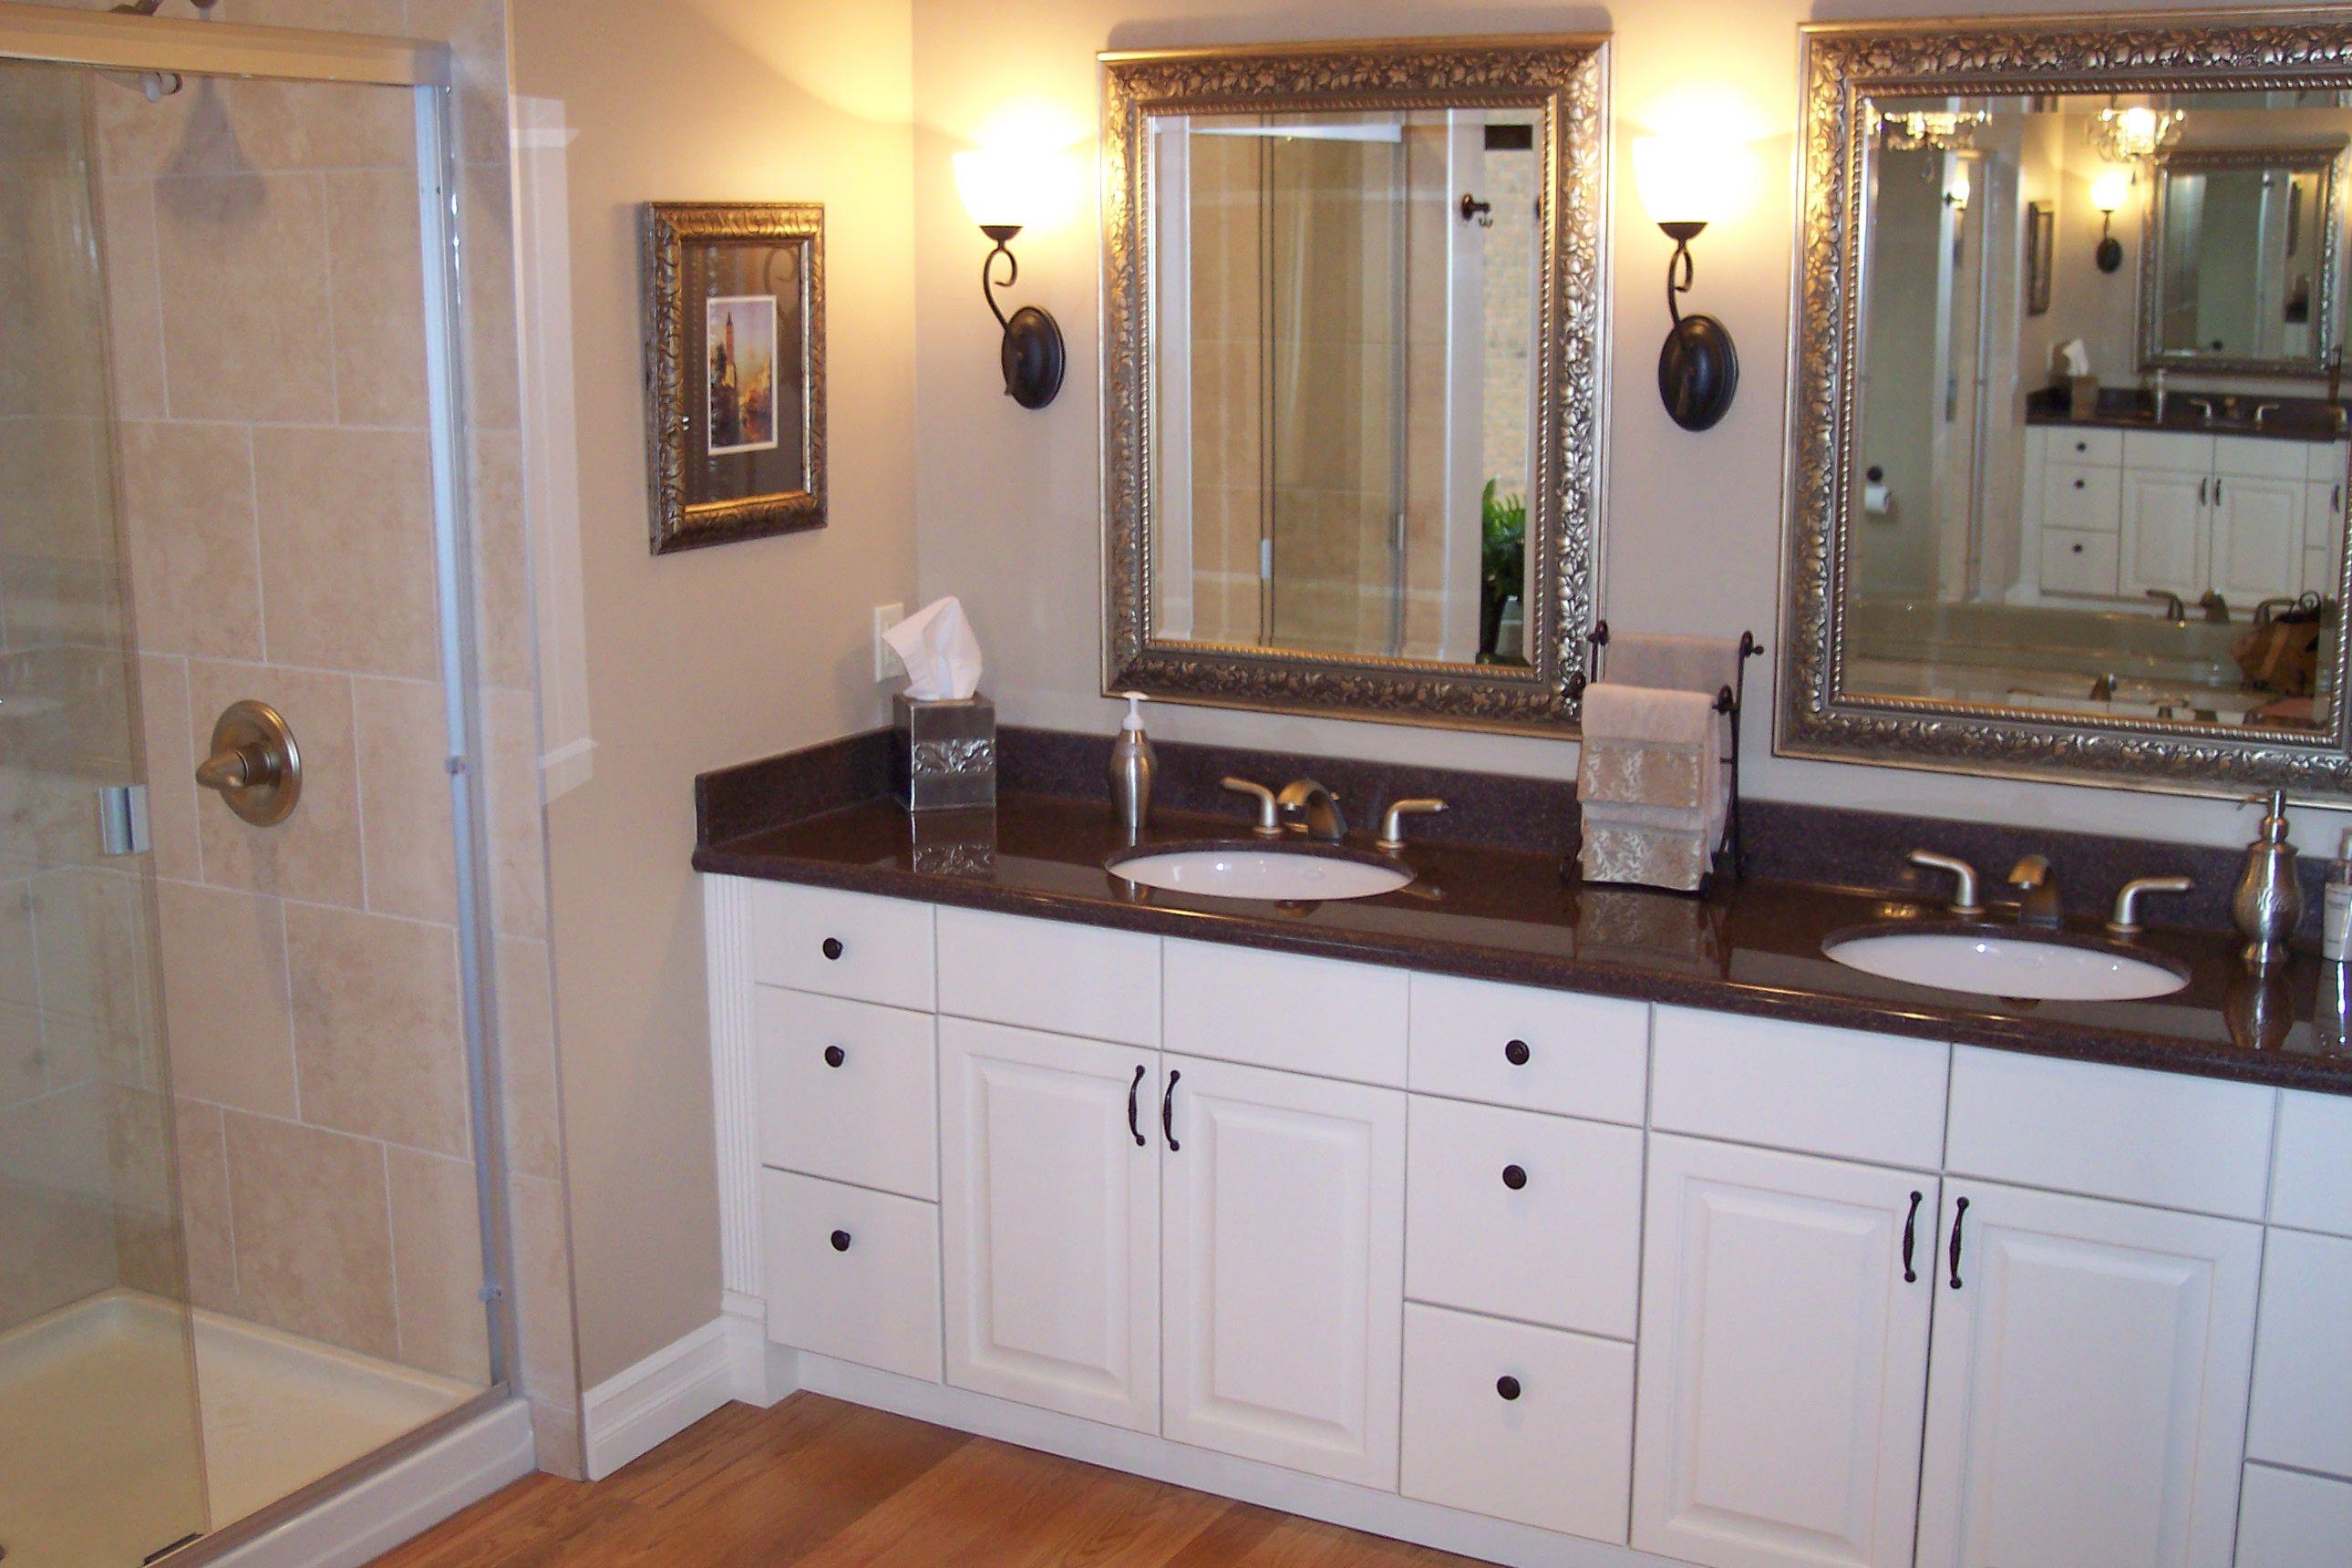 Woodlands Bathroom Vanity Tile Shower and Undermount Sinks